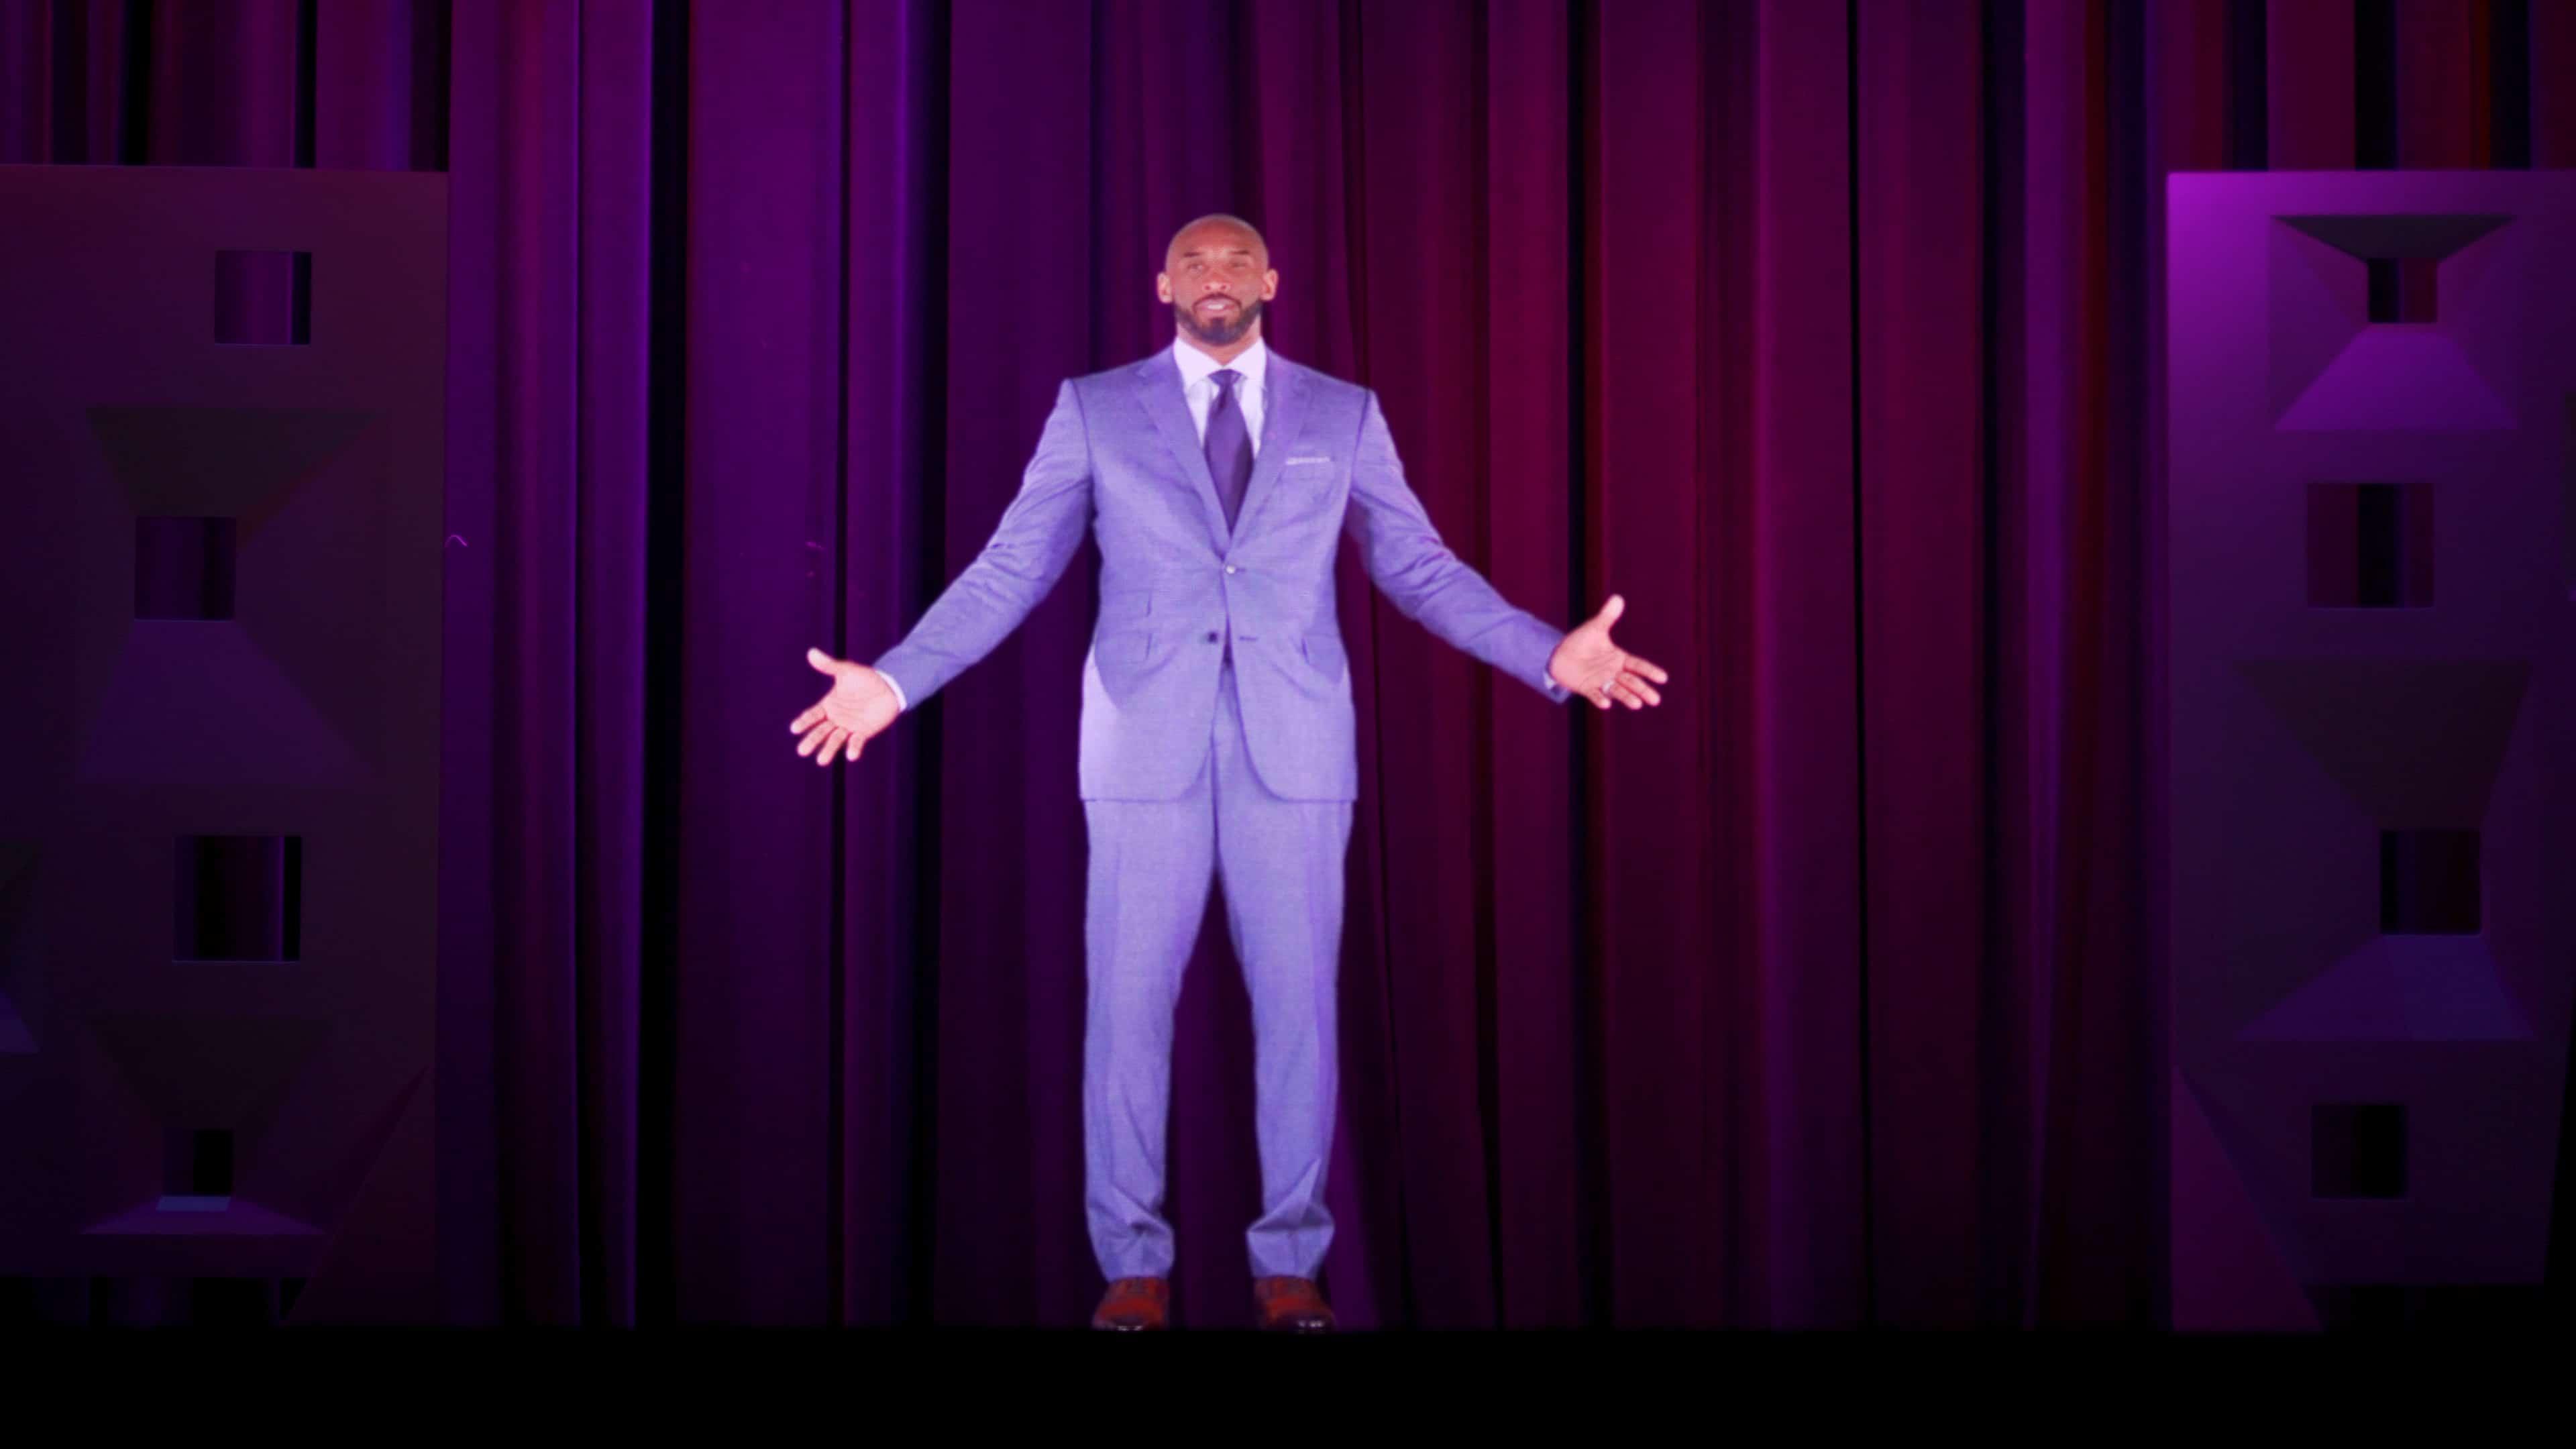 Los Angeles Celebrates Record Milestone of 50 Million Visitors in 2018 with Kobe Bryant Hologram